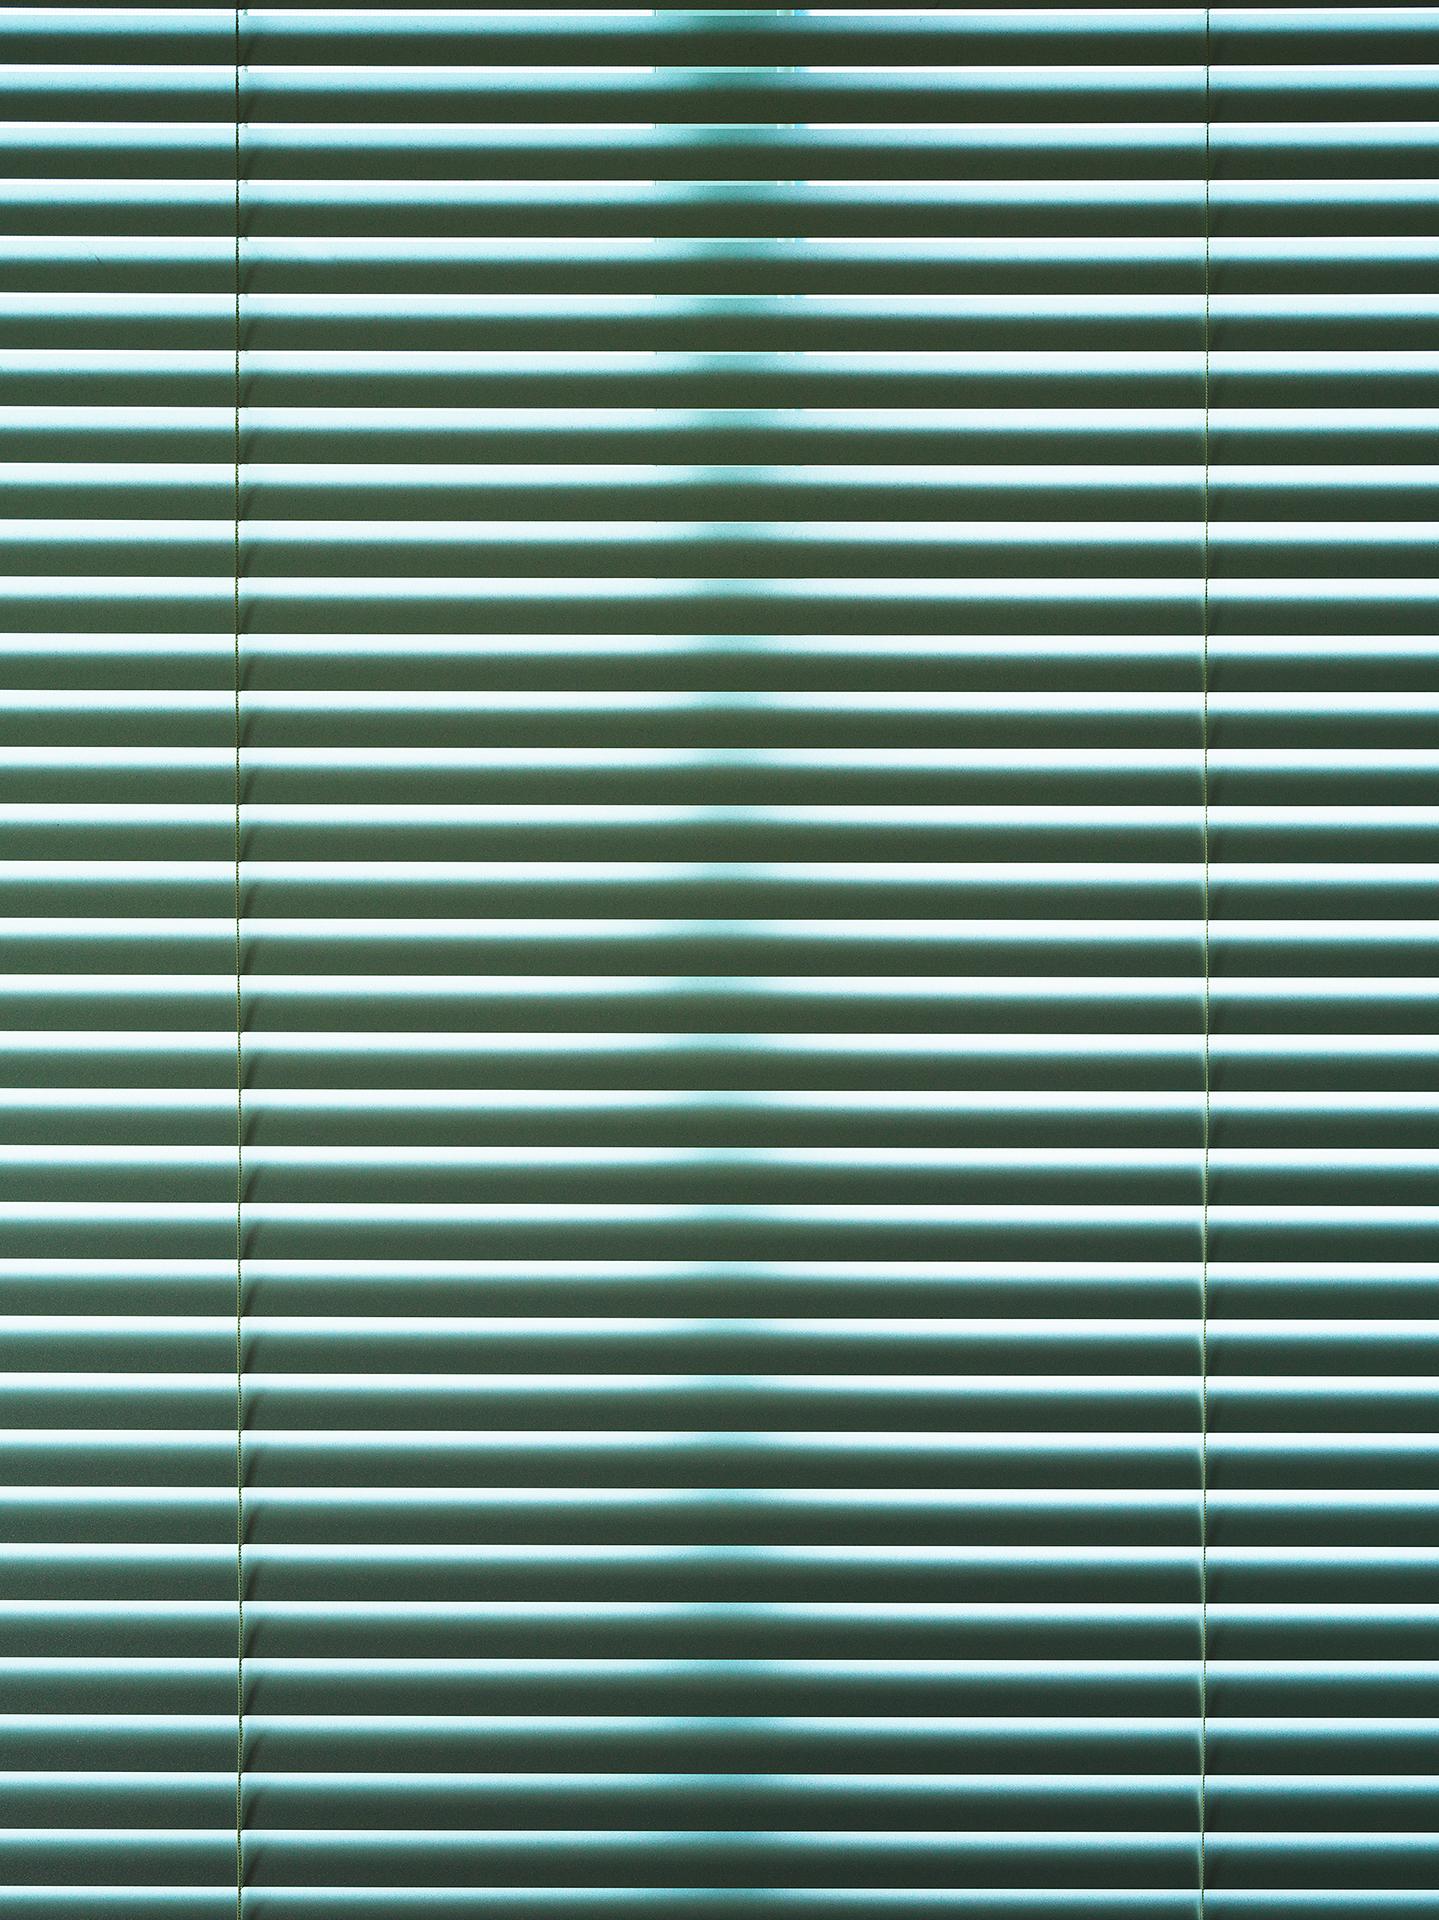 Light Flow : lf, Pe-66   pigment print, diasec, framed  120 x 90cm, 2016